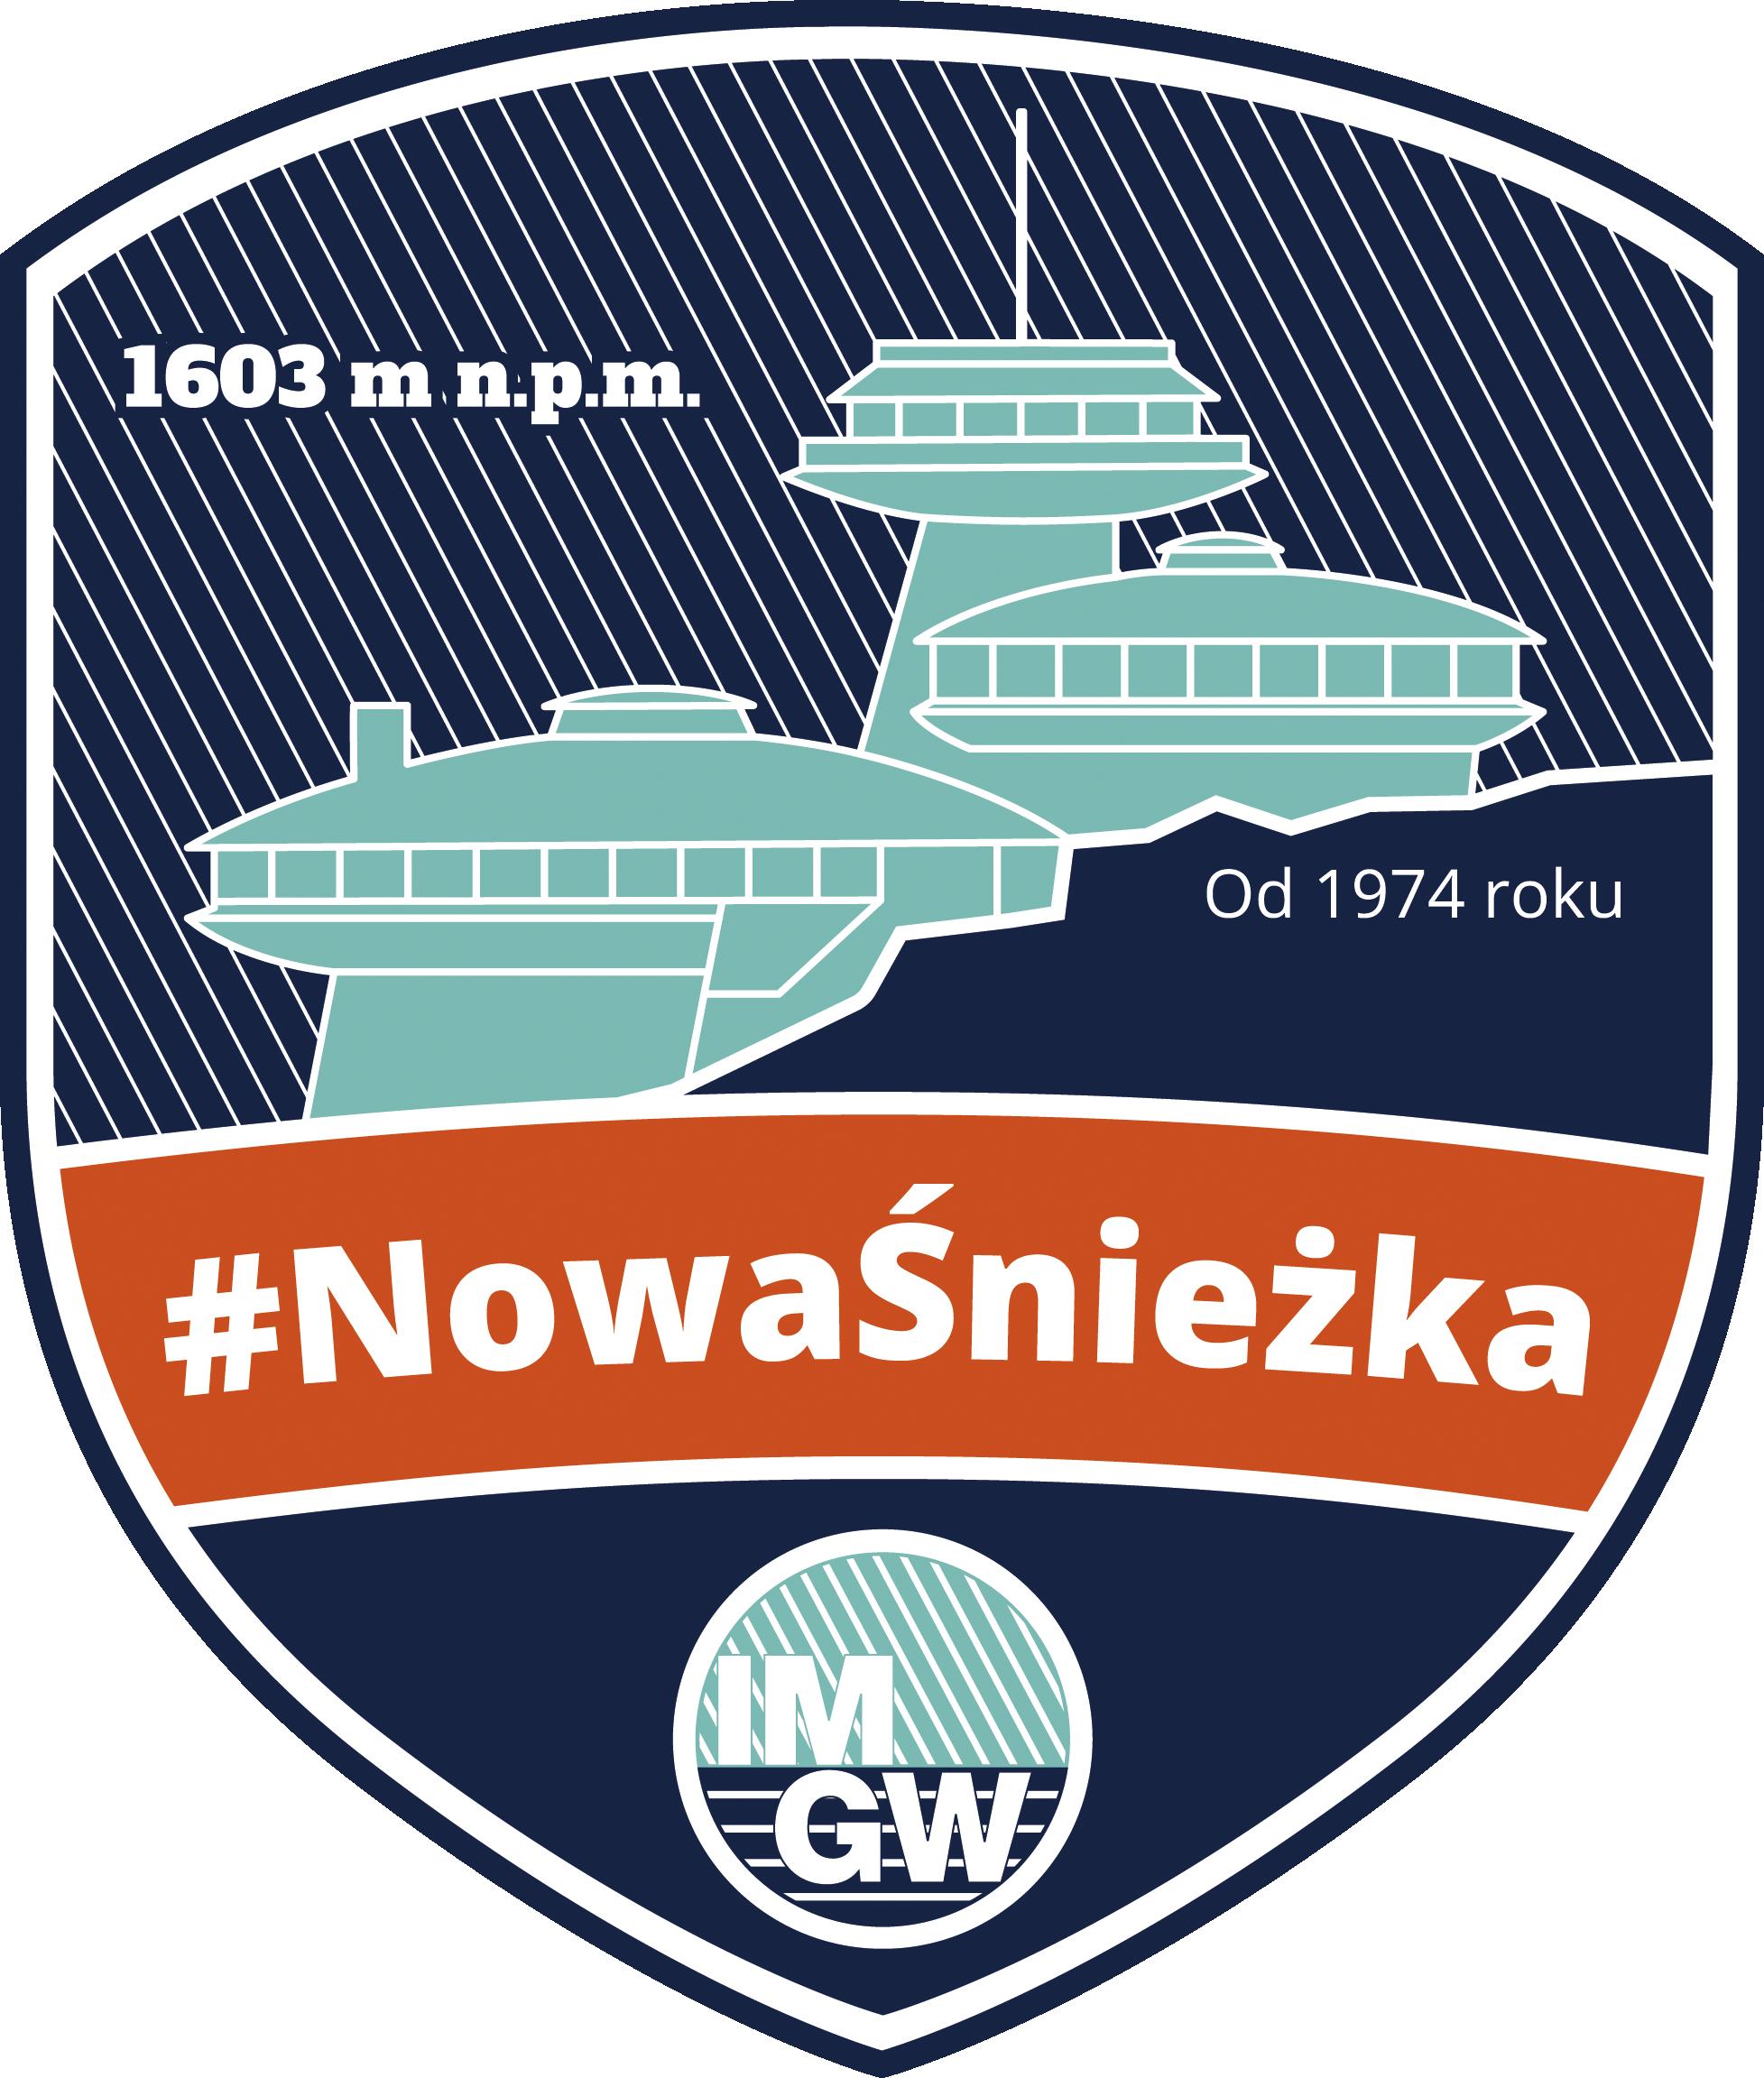 nowa sniezka logo